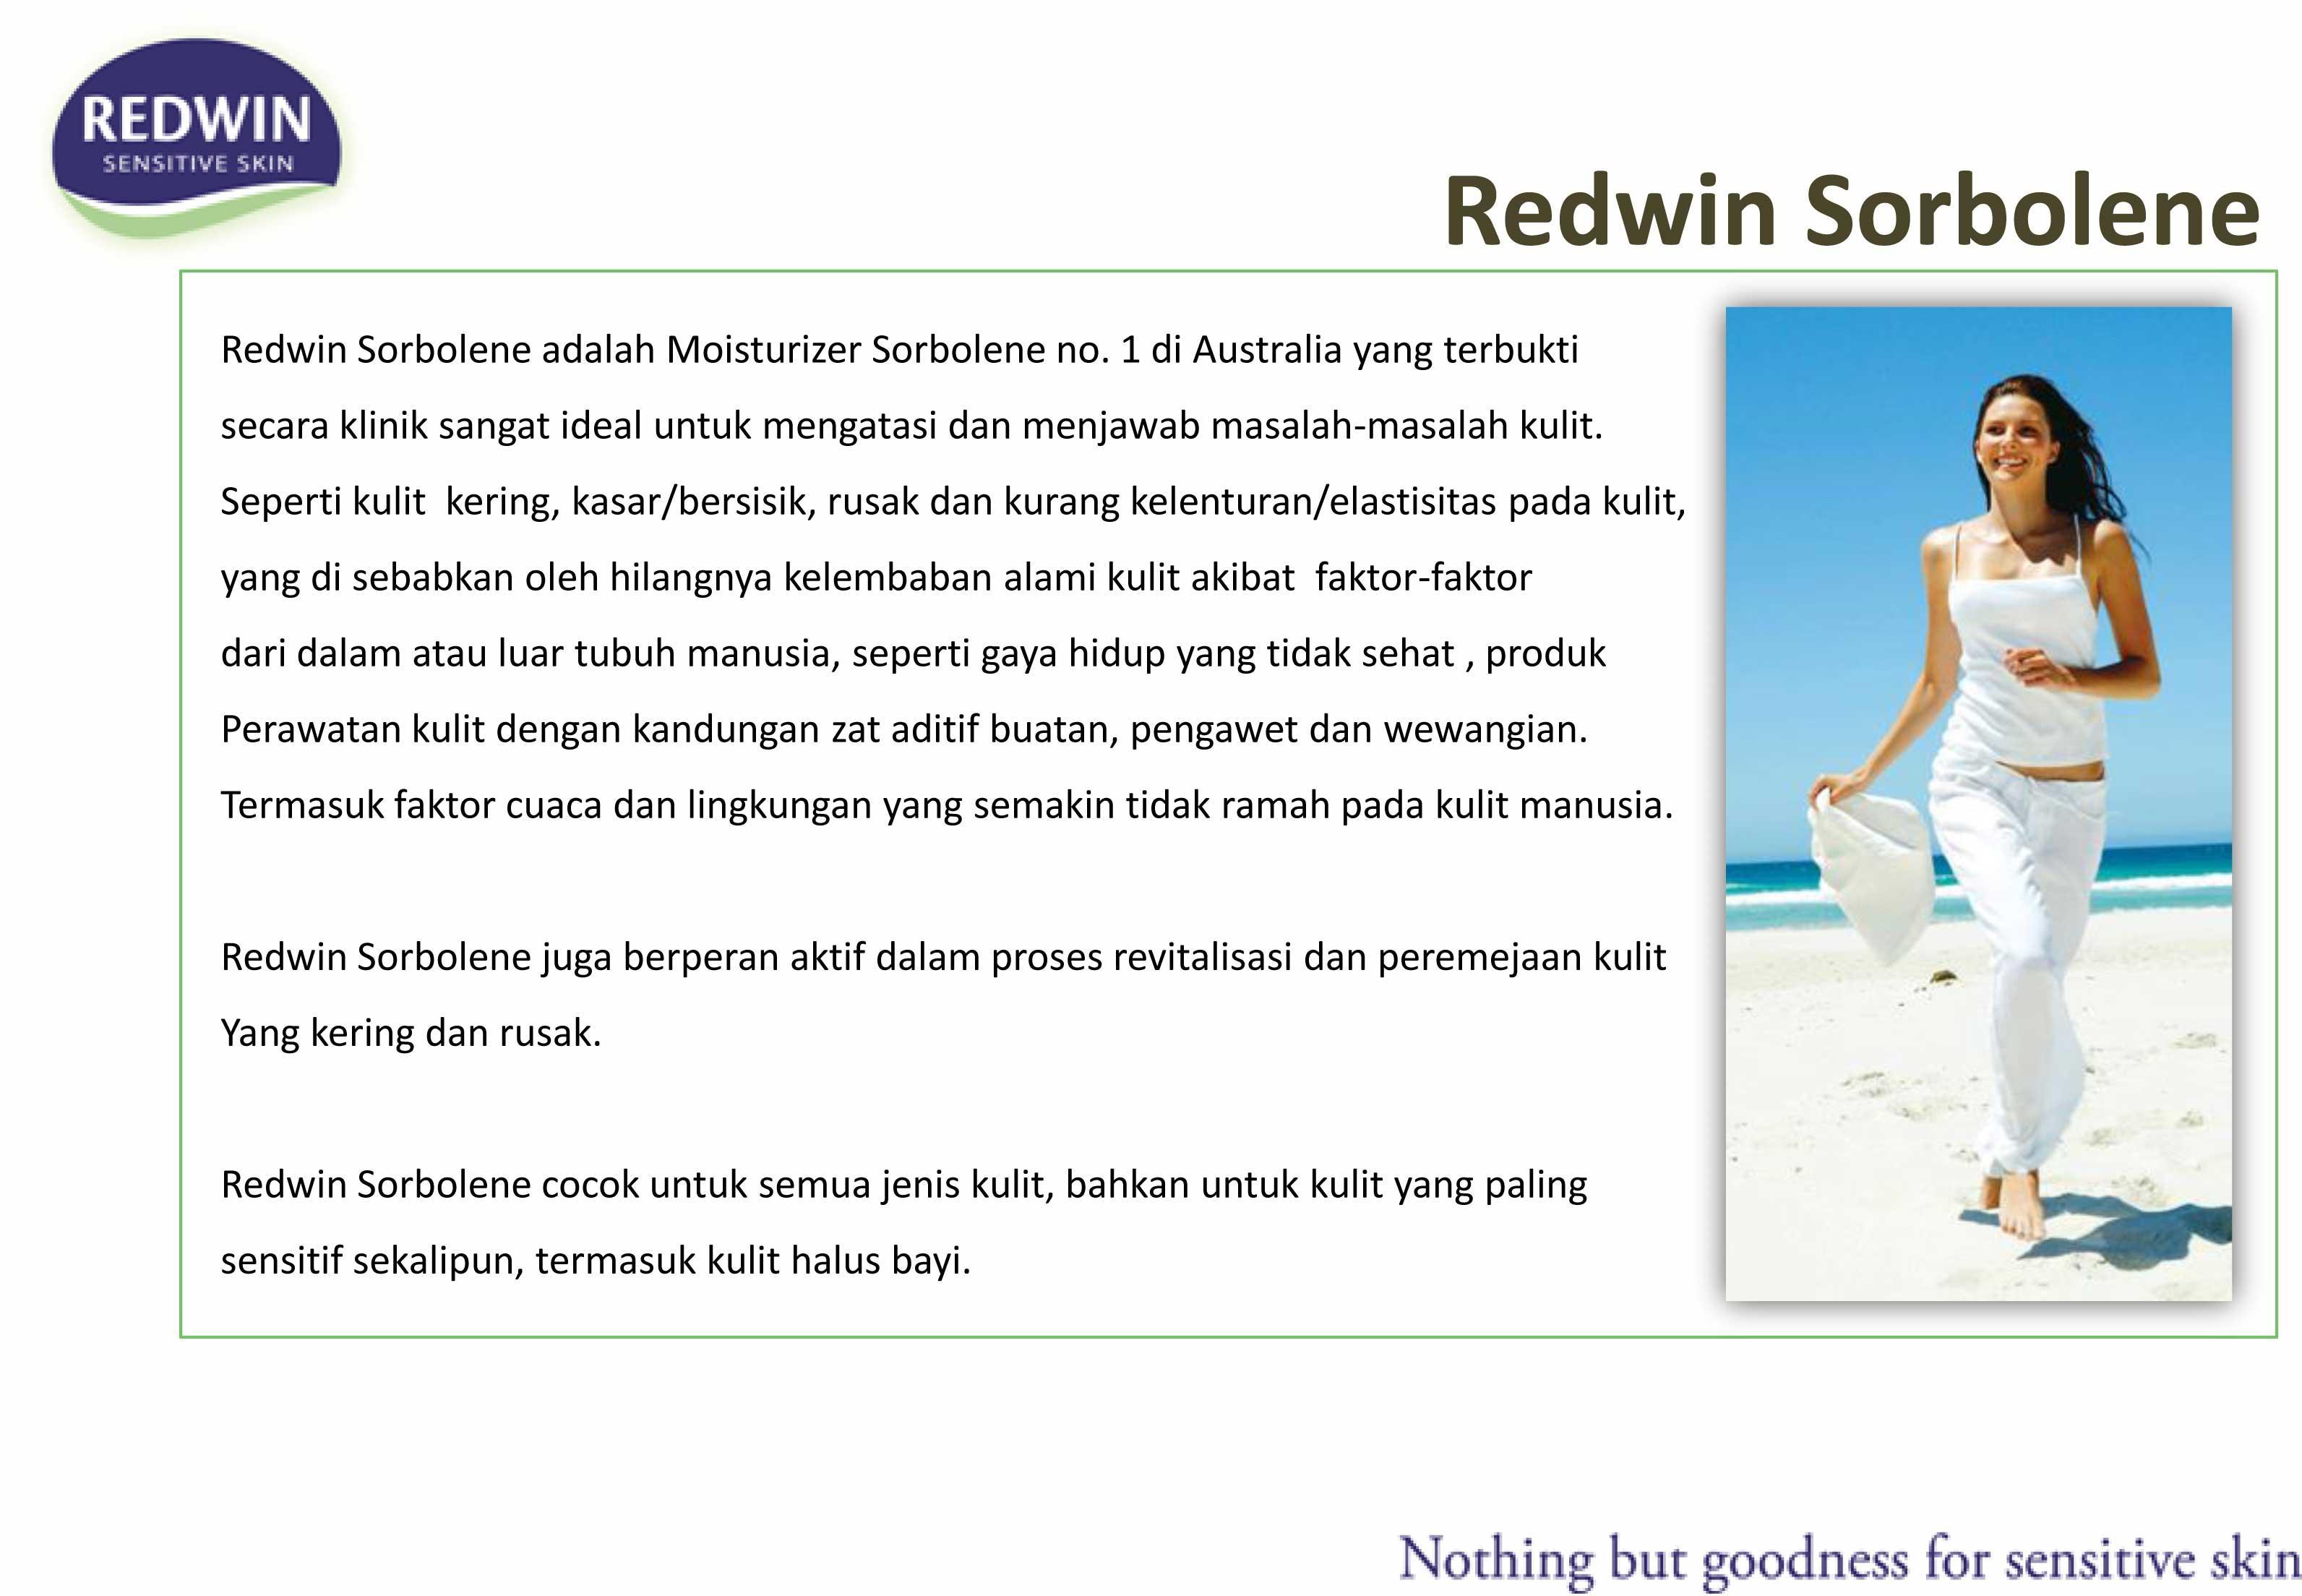 Redwin - Sorbolene Moisturiser w/ Vit E (Choose Size)